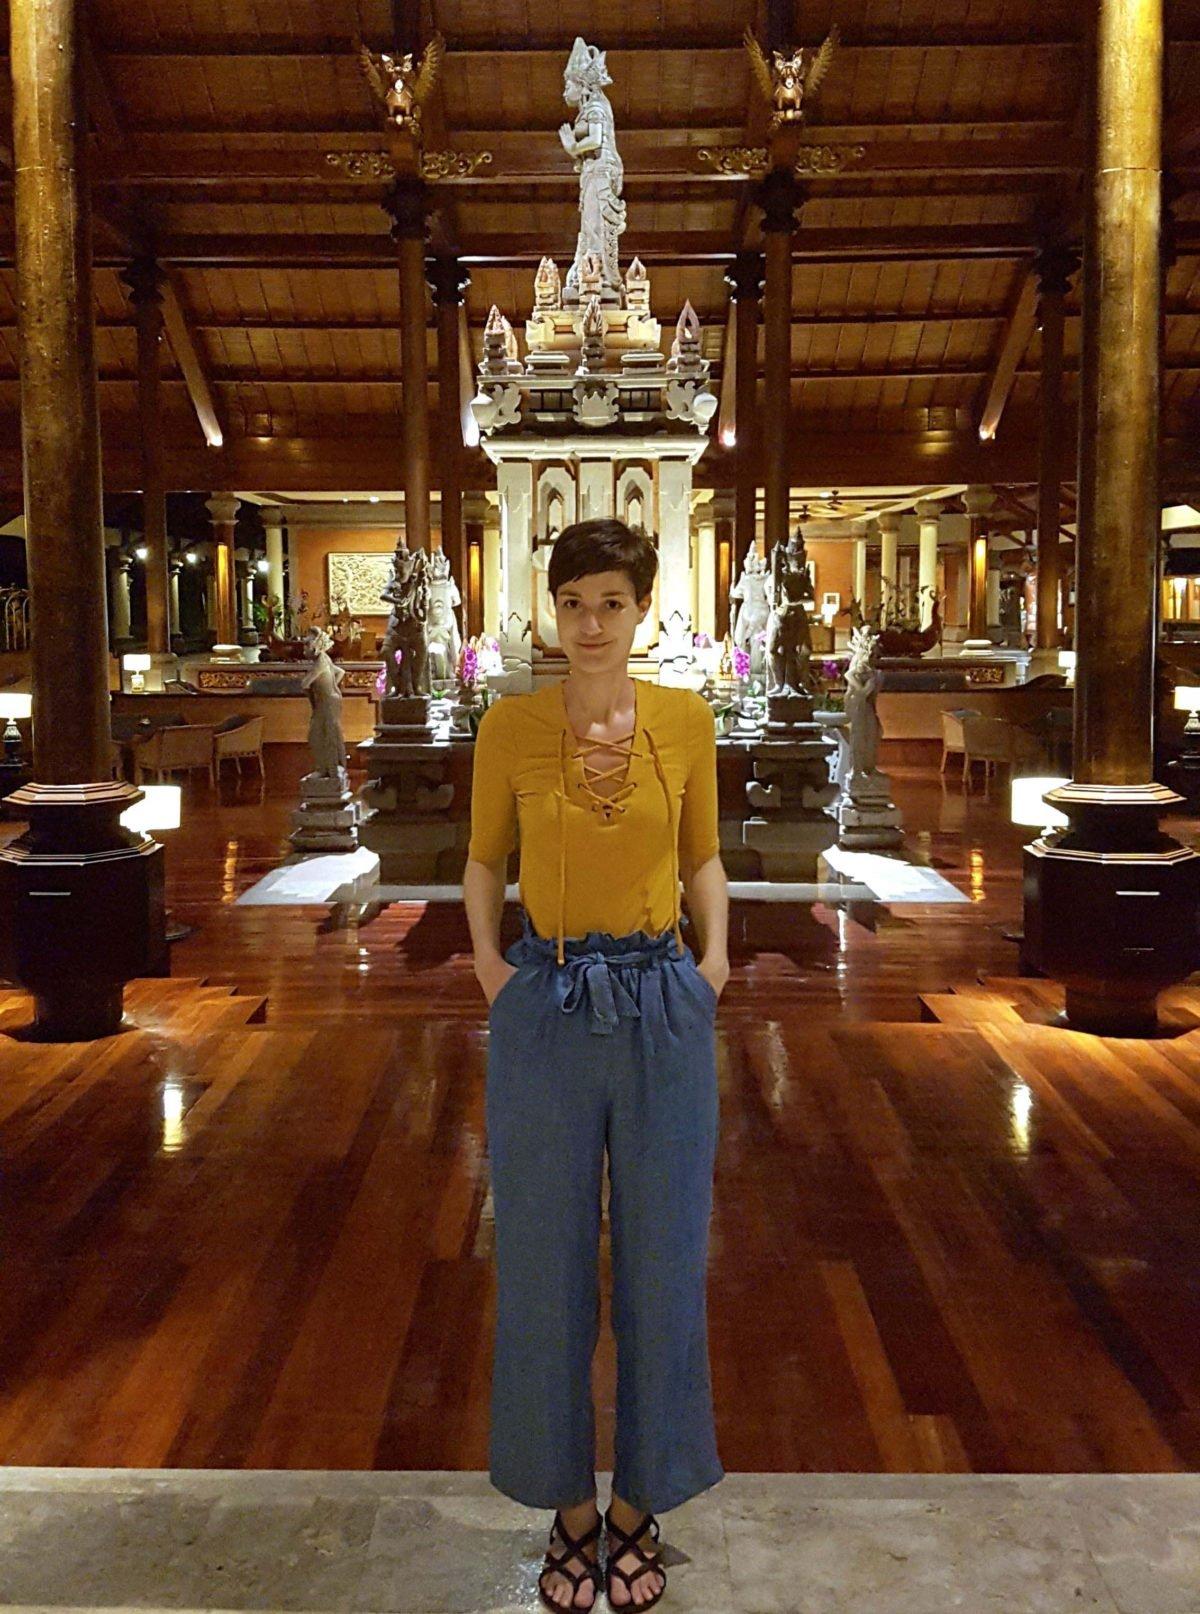 Mein Outfit in der Lobby des Ayodya Hotels Bali